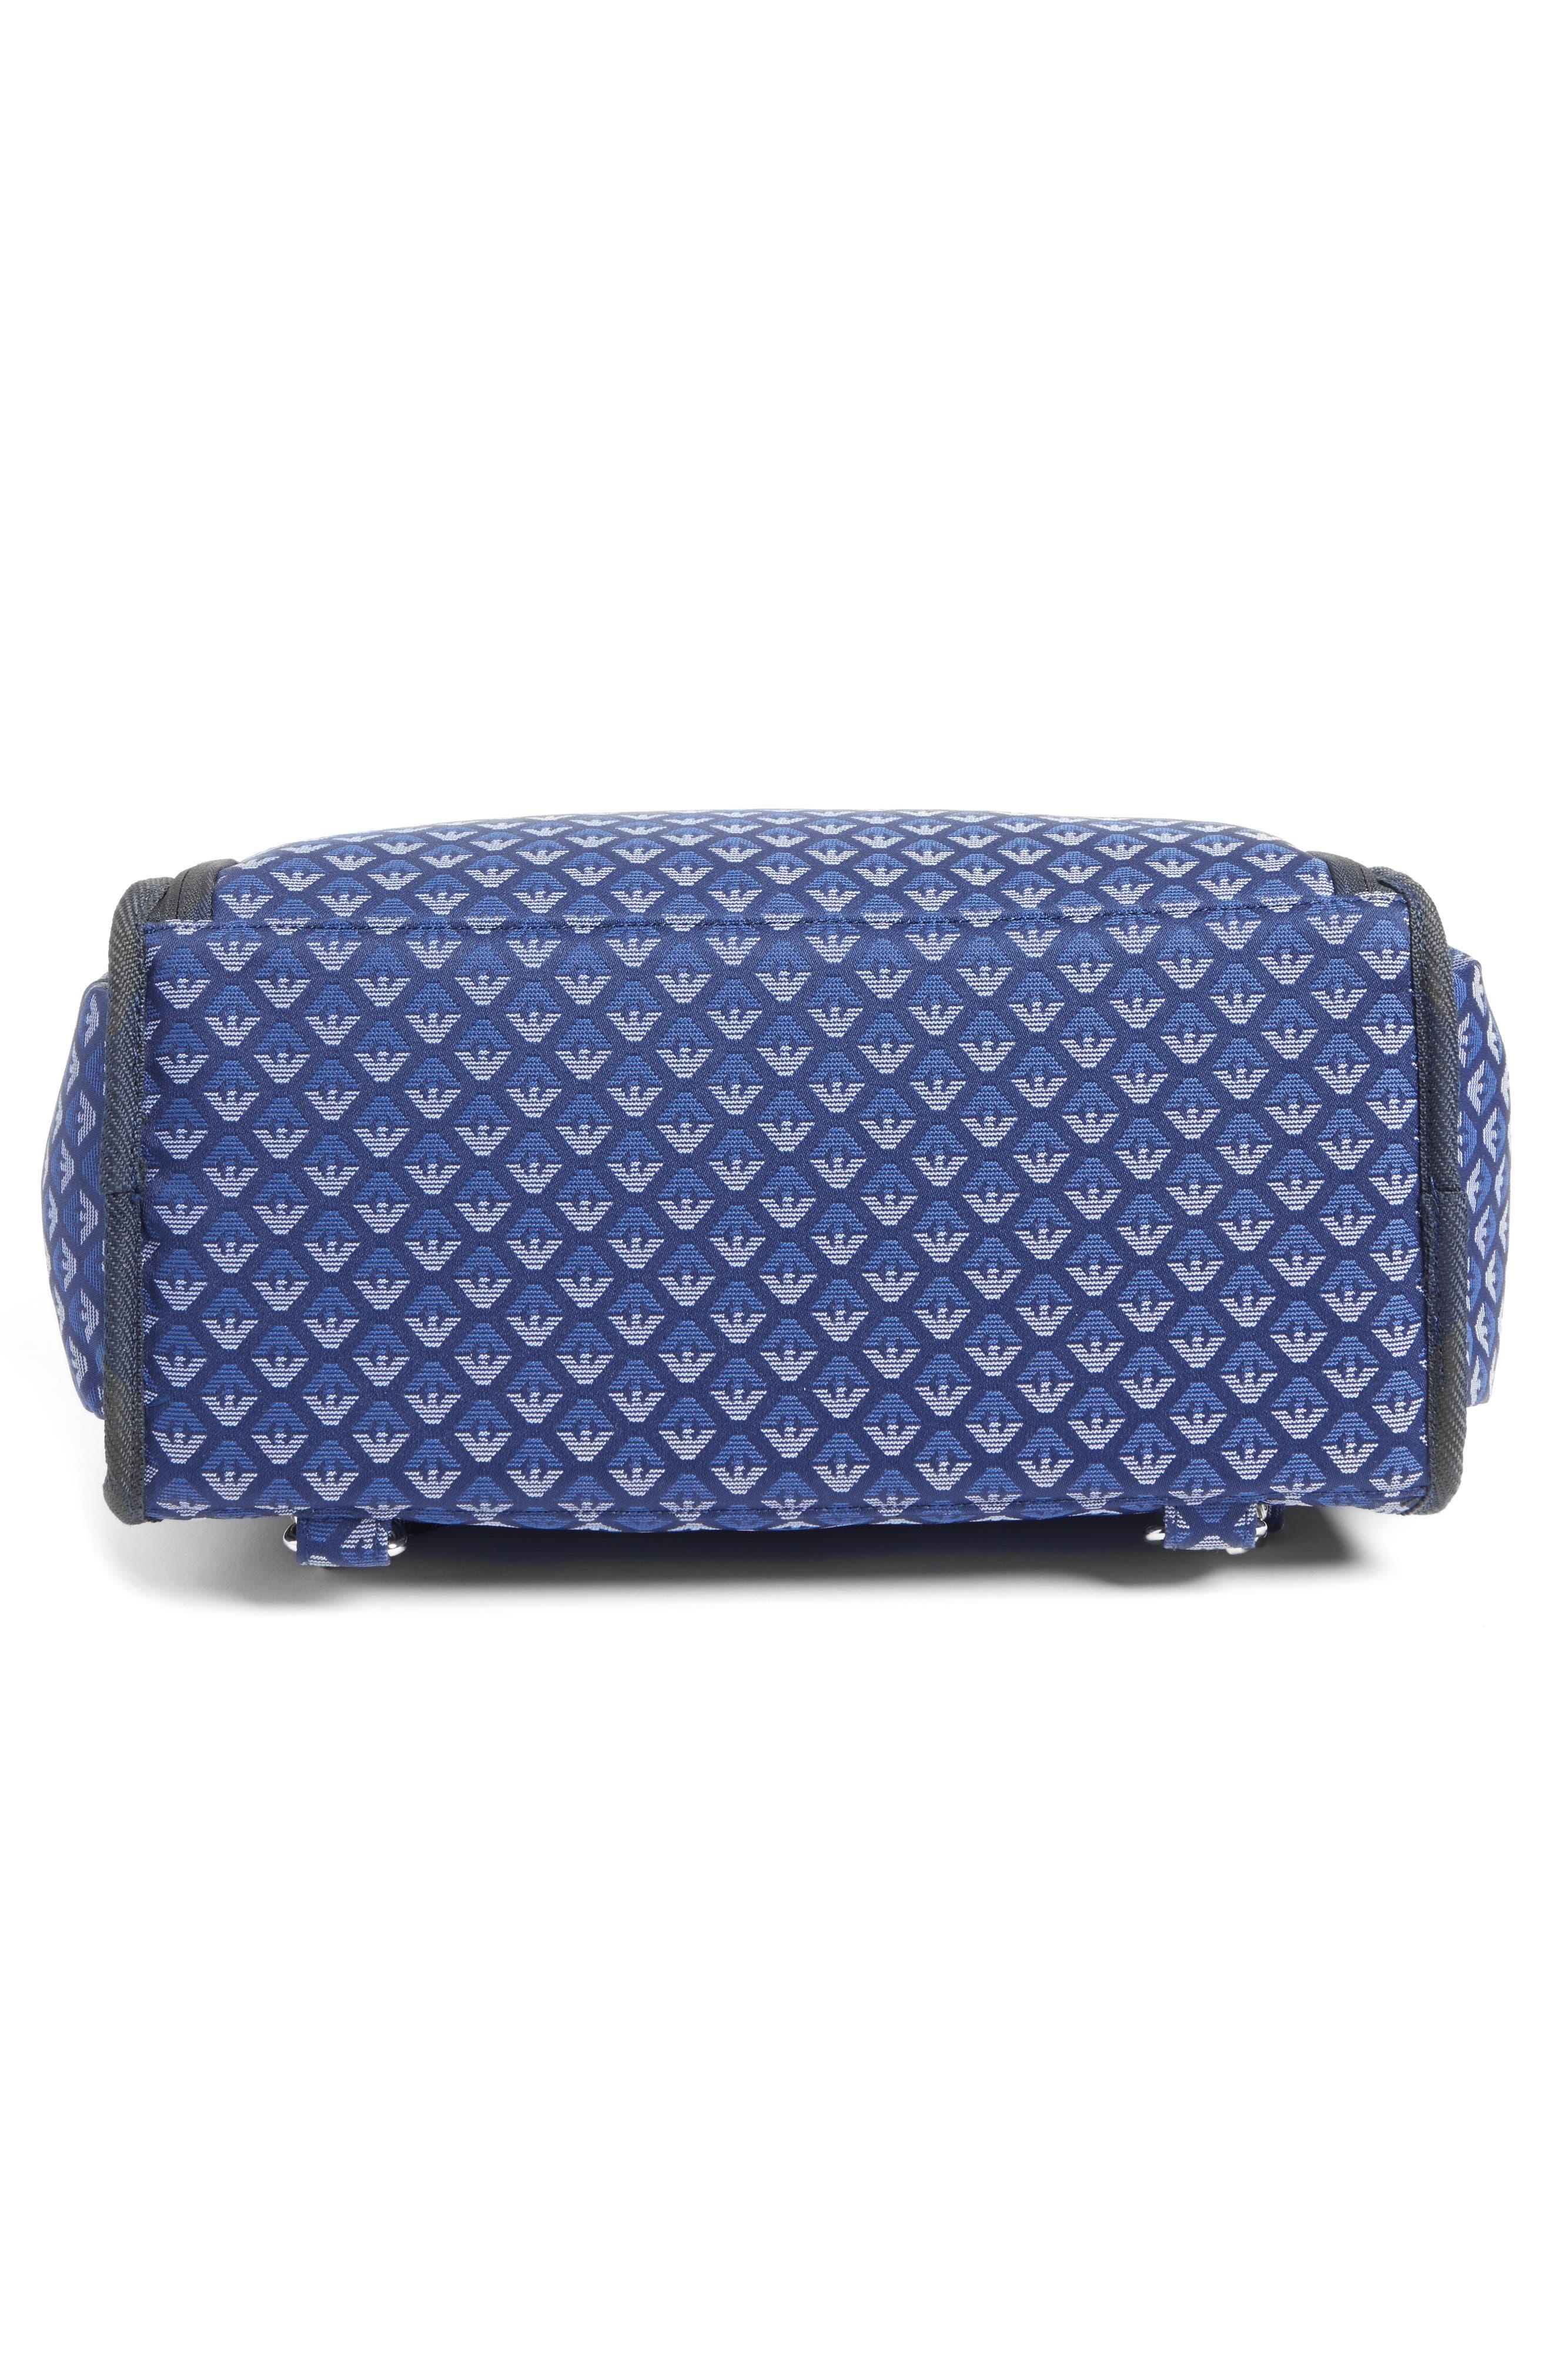 Diaper Bag,                             Alternate thumbnail 5, color,                             NAVY BLUE